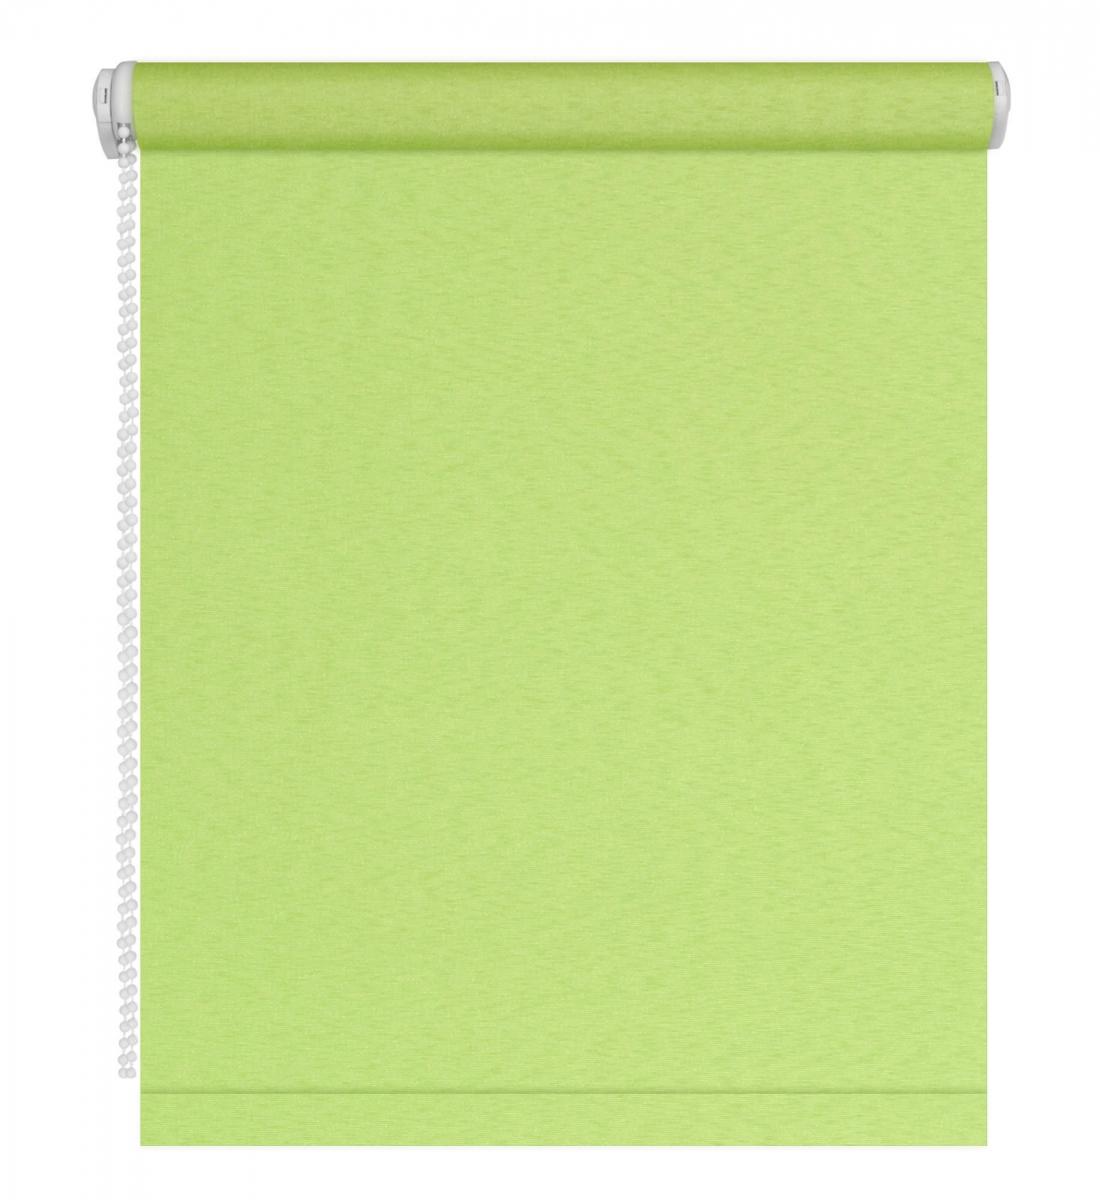 Рулонные шторы Maegan Цвет: Зеленый